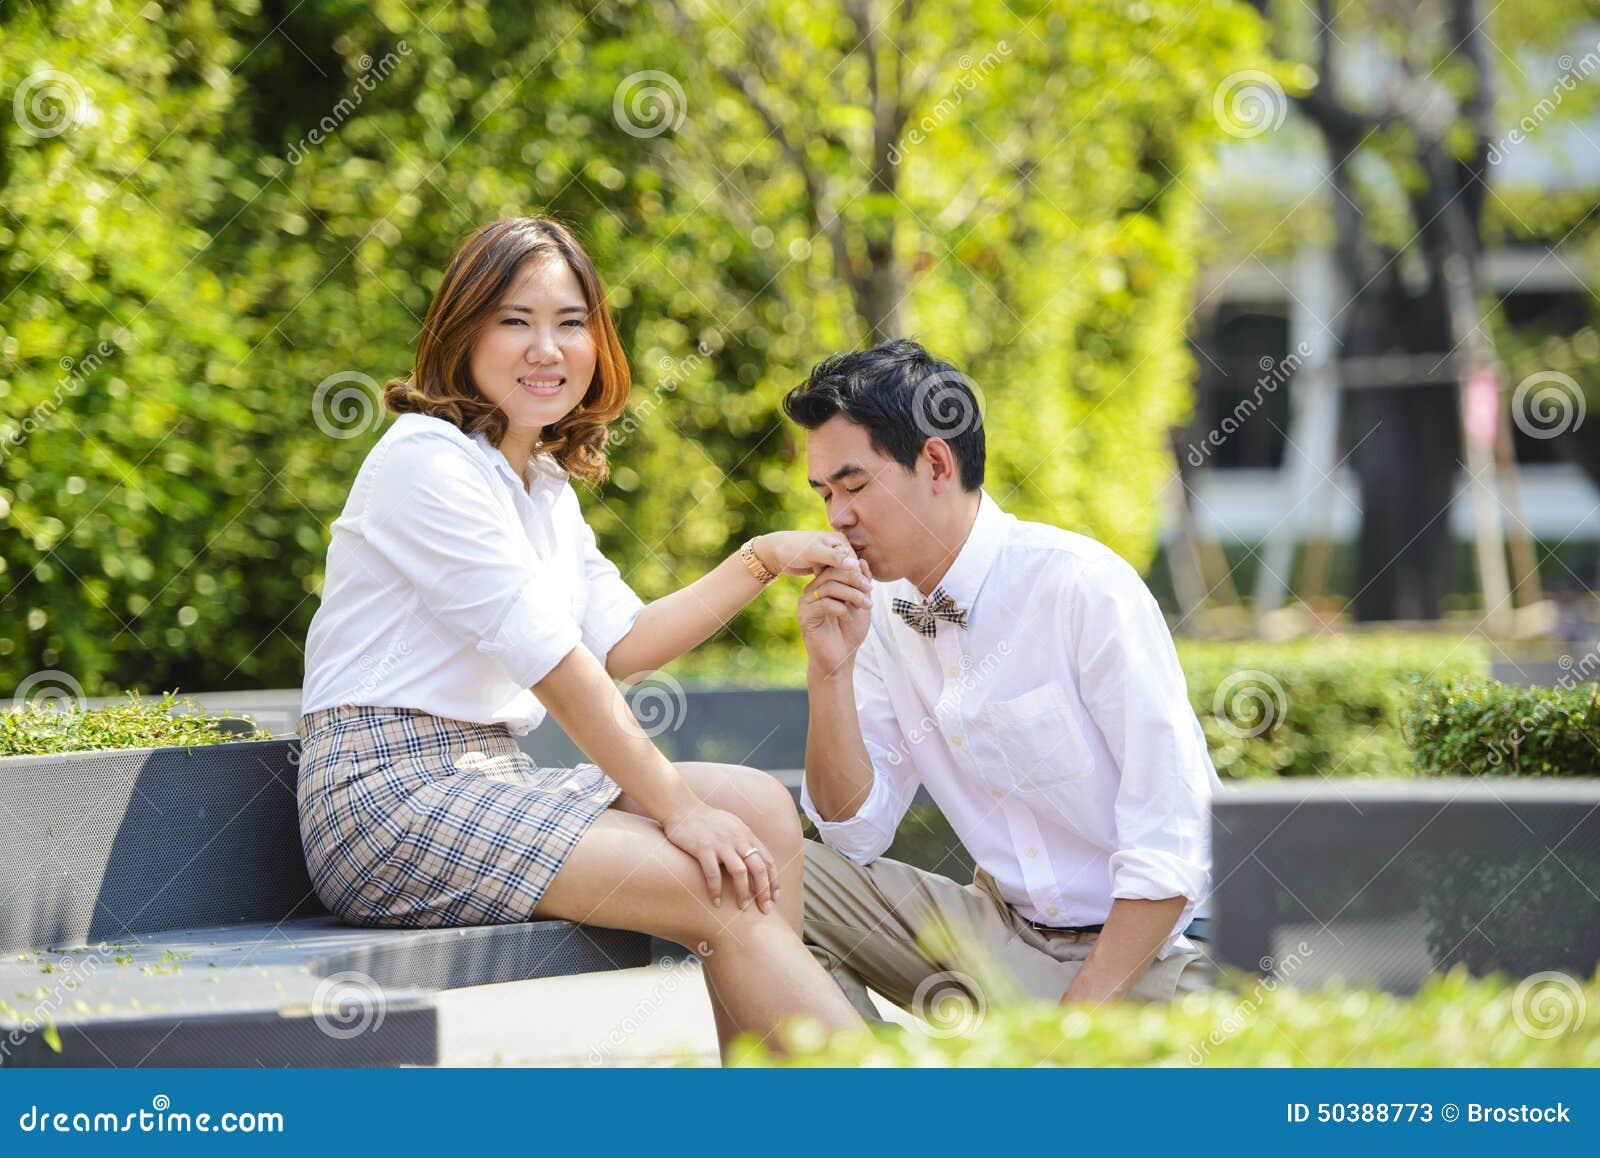 no self esteem dating